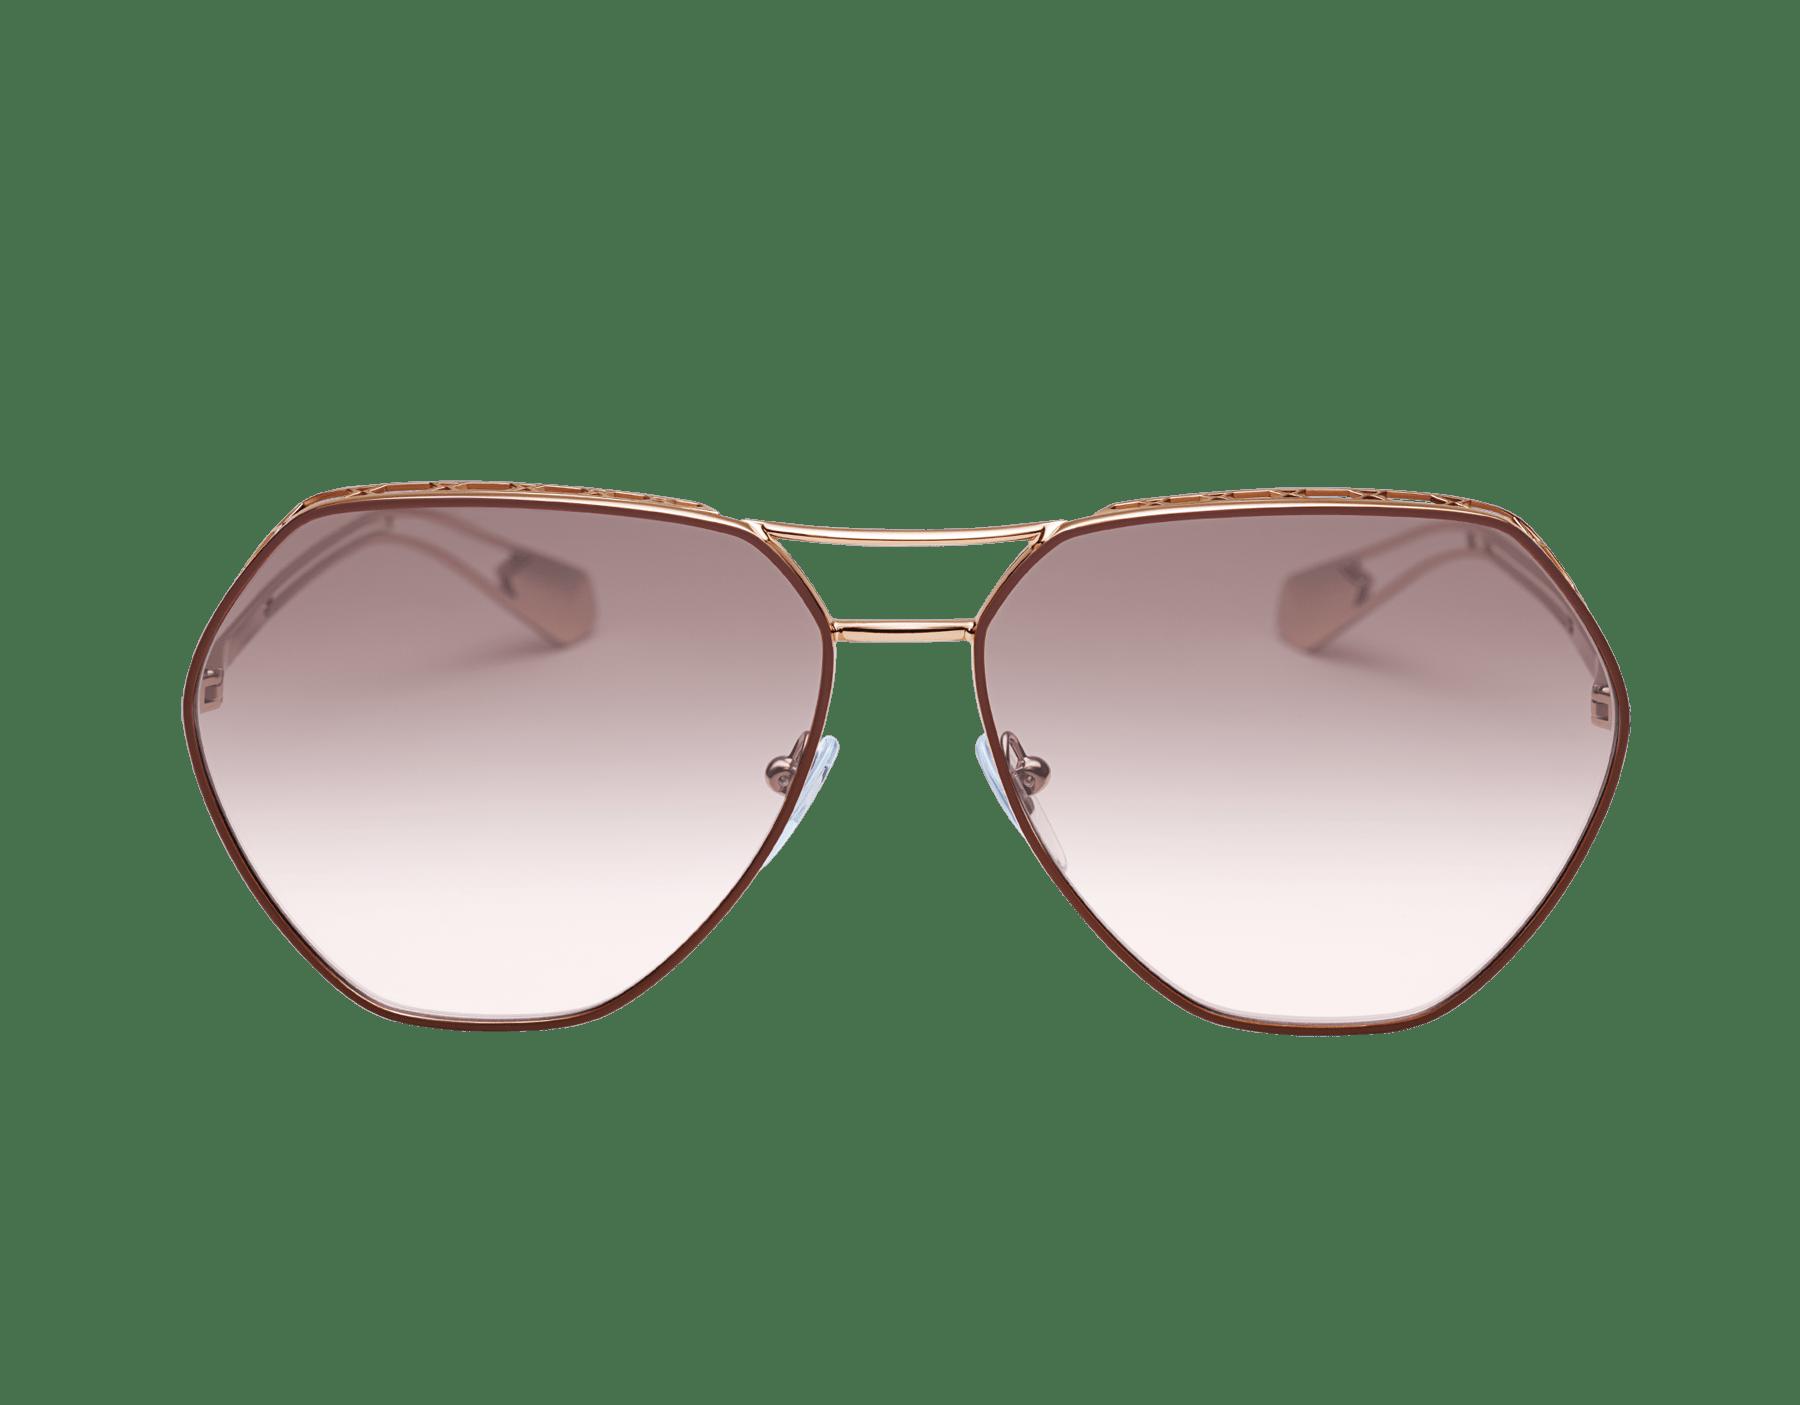 Serpenti 'Freedomation' oversized aviator sunglasses with flat, angular lenses. 903681 image 2